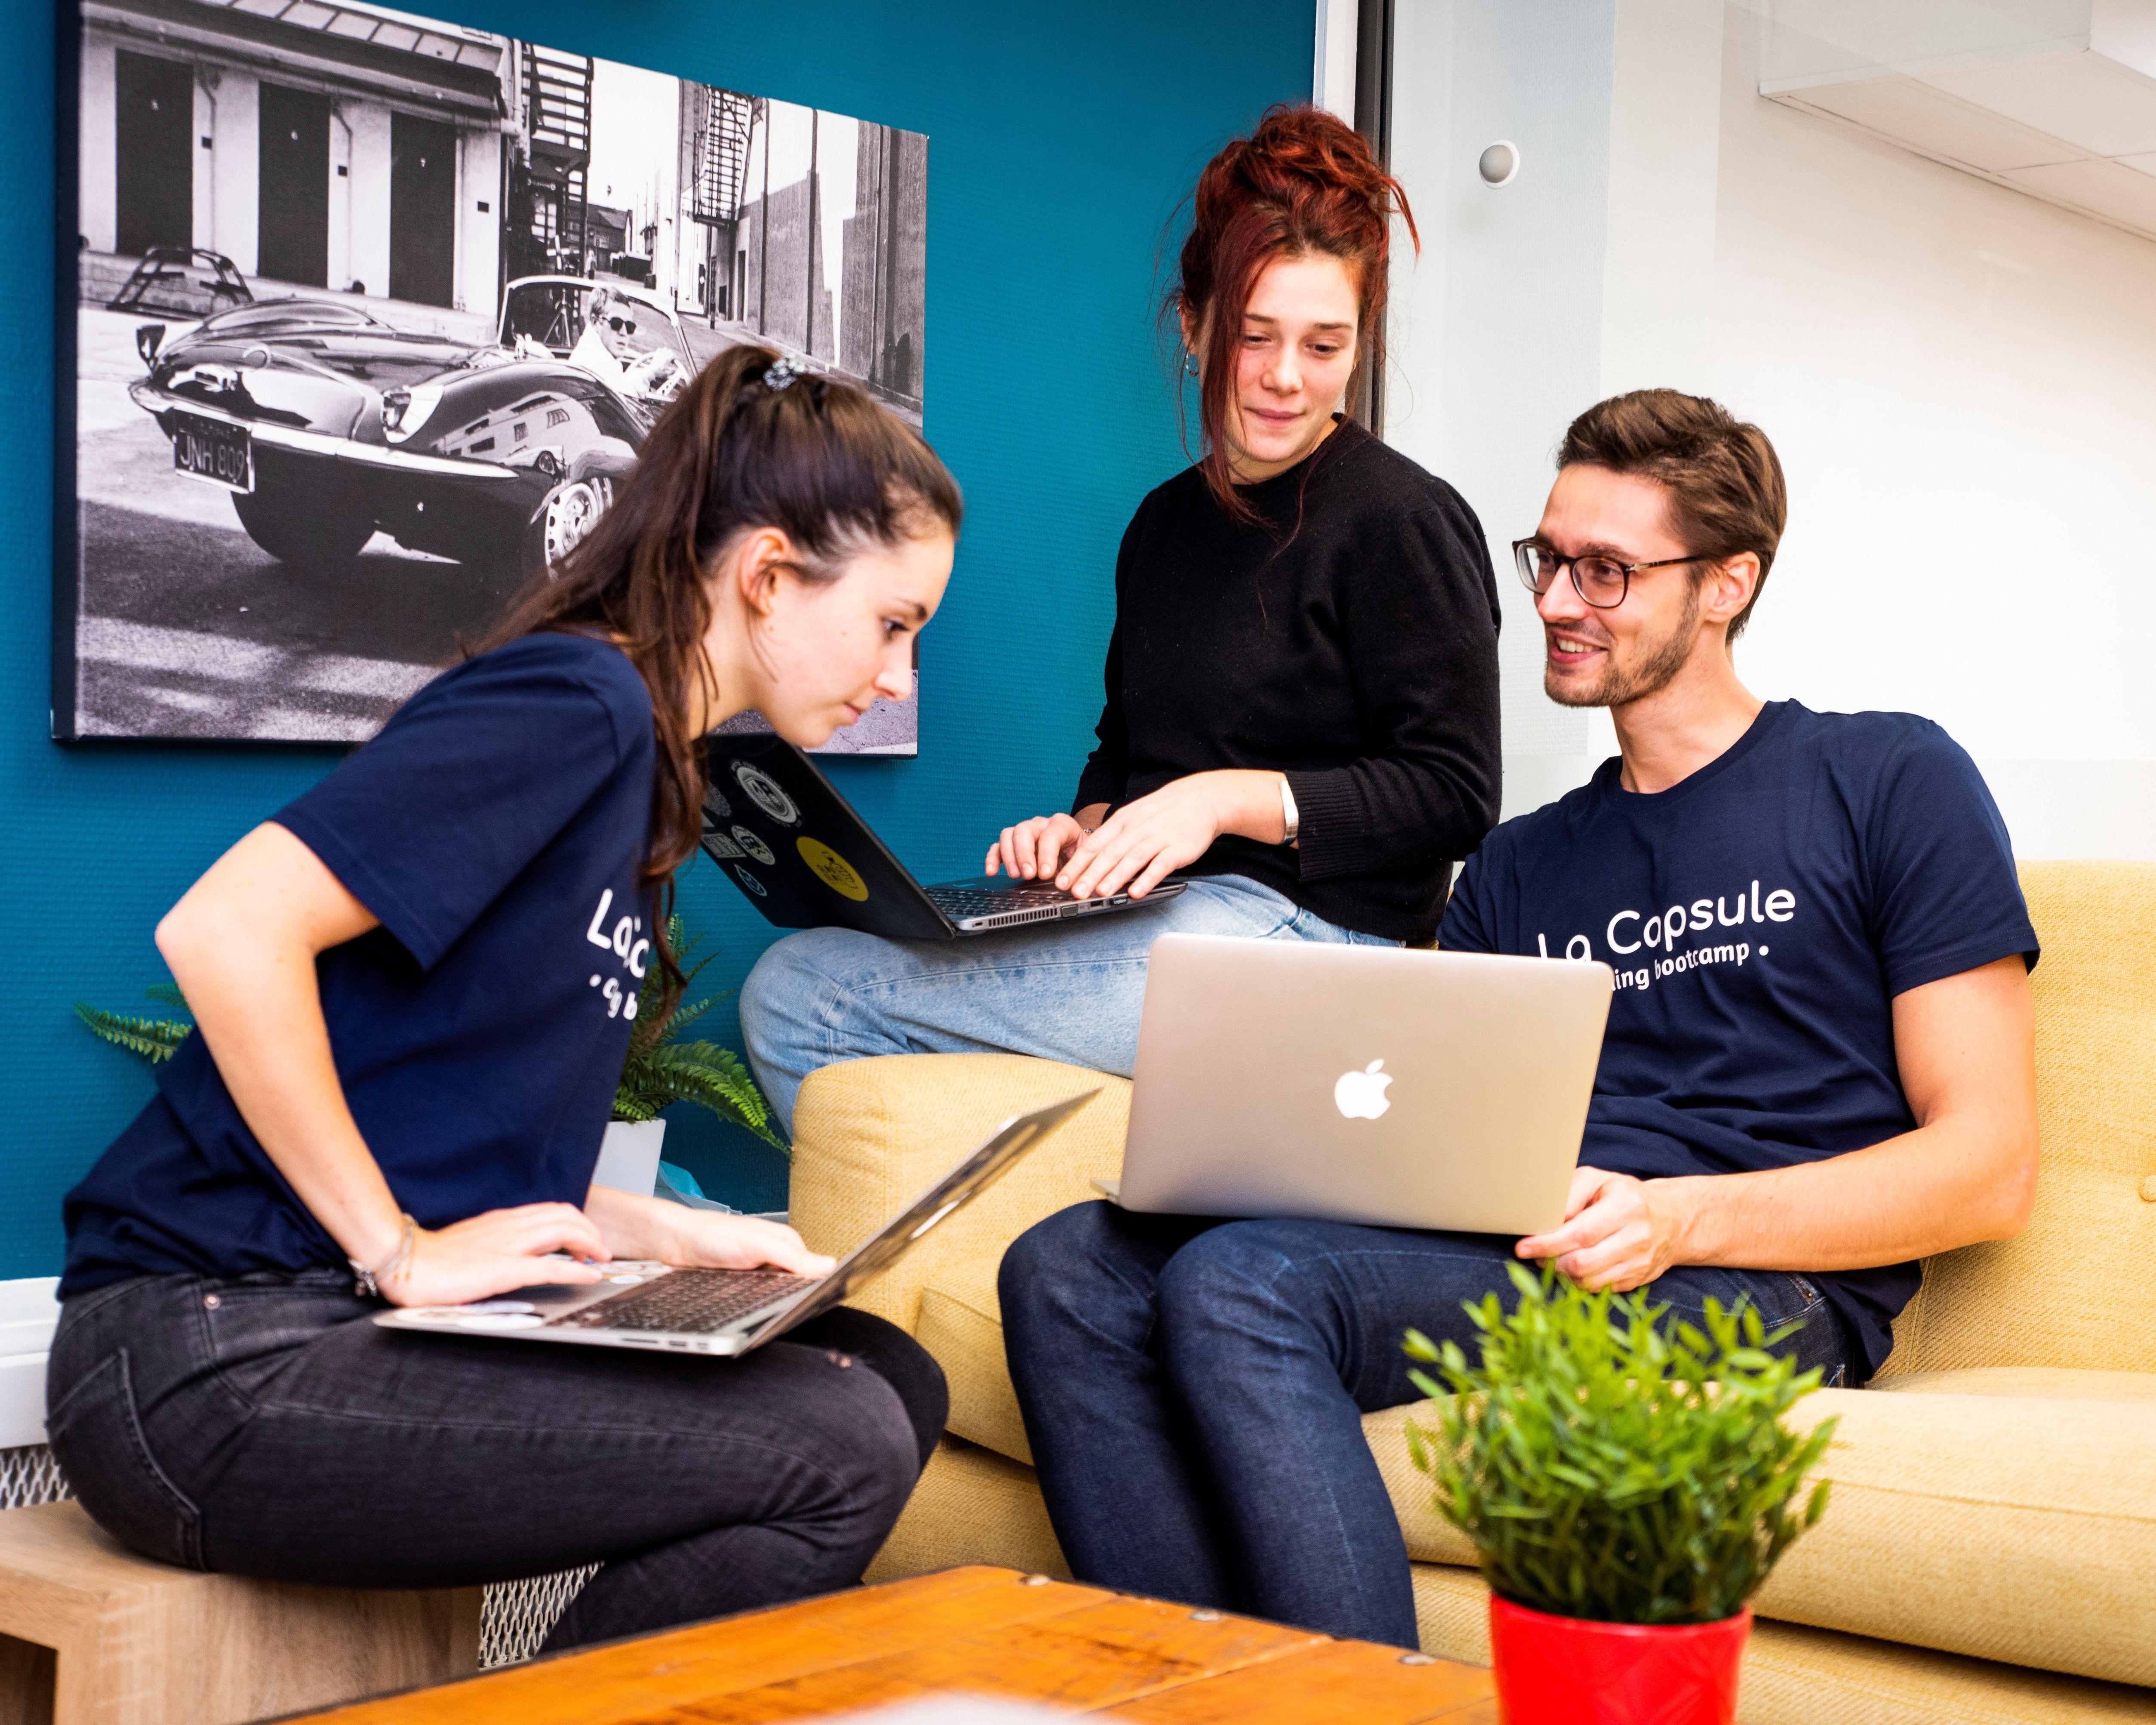 Apprendre la programmation : choisir le bon Coding Bootcamp 🚀